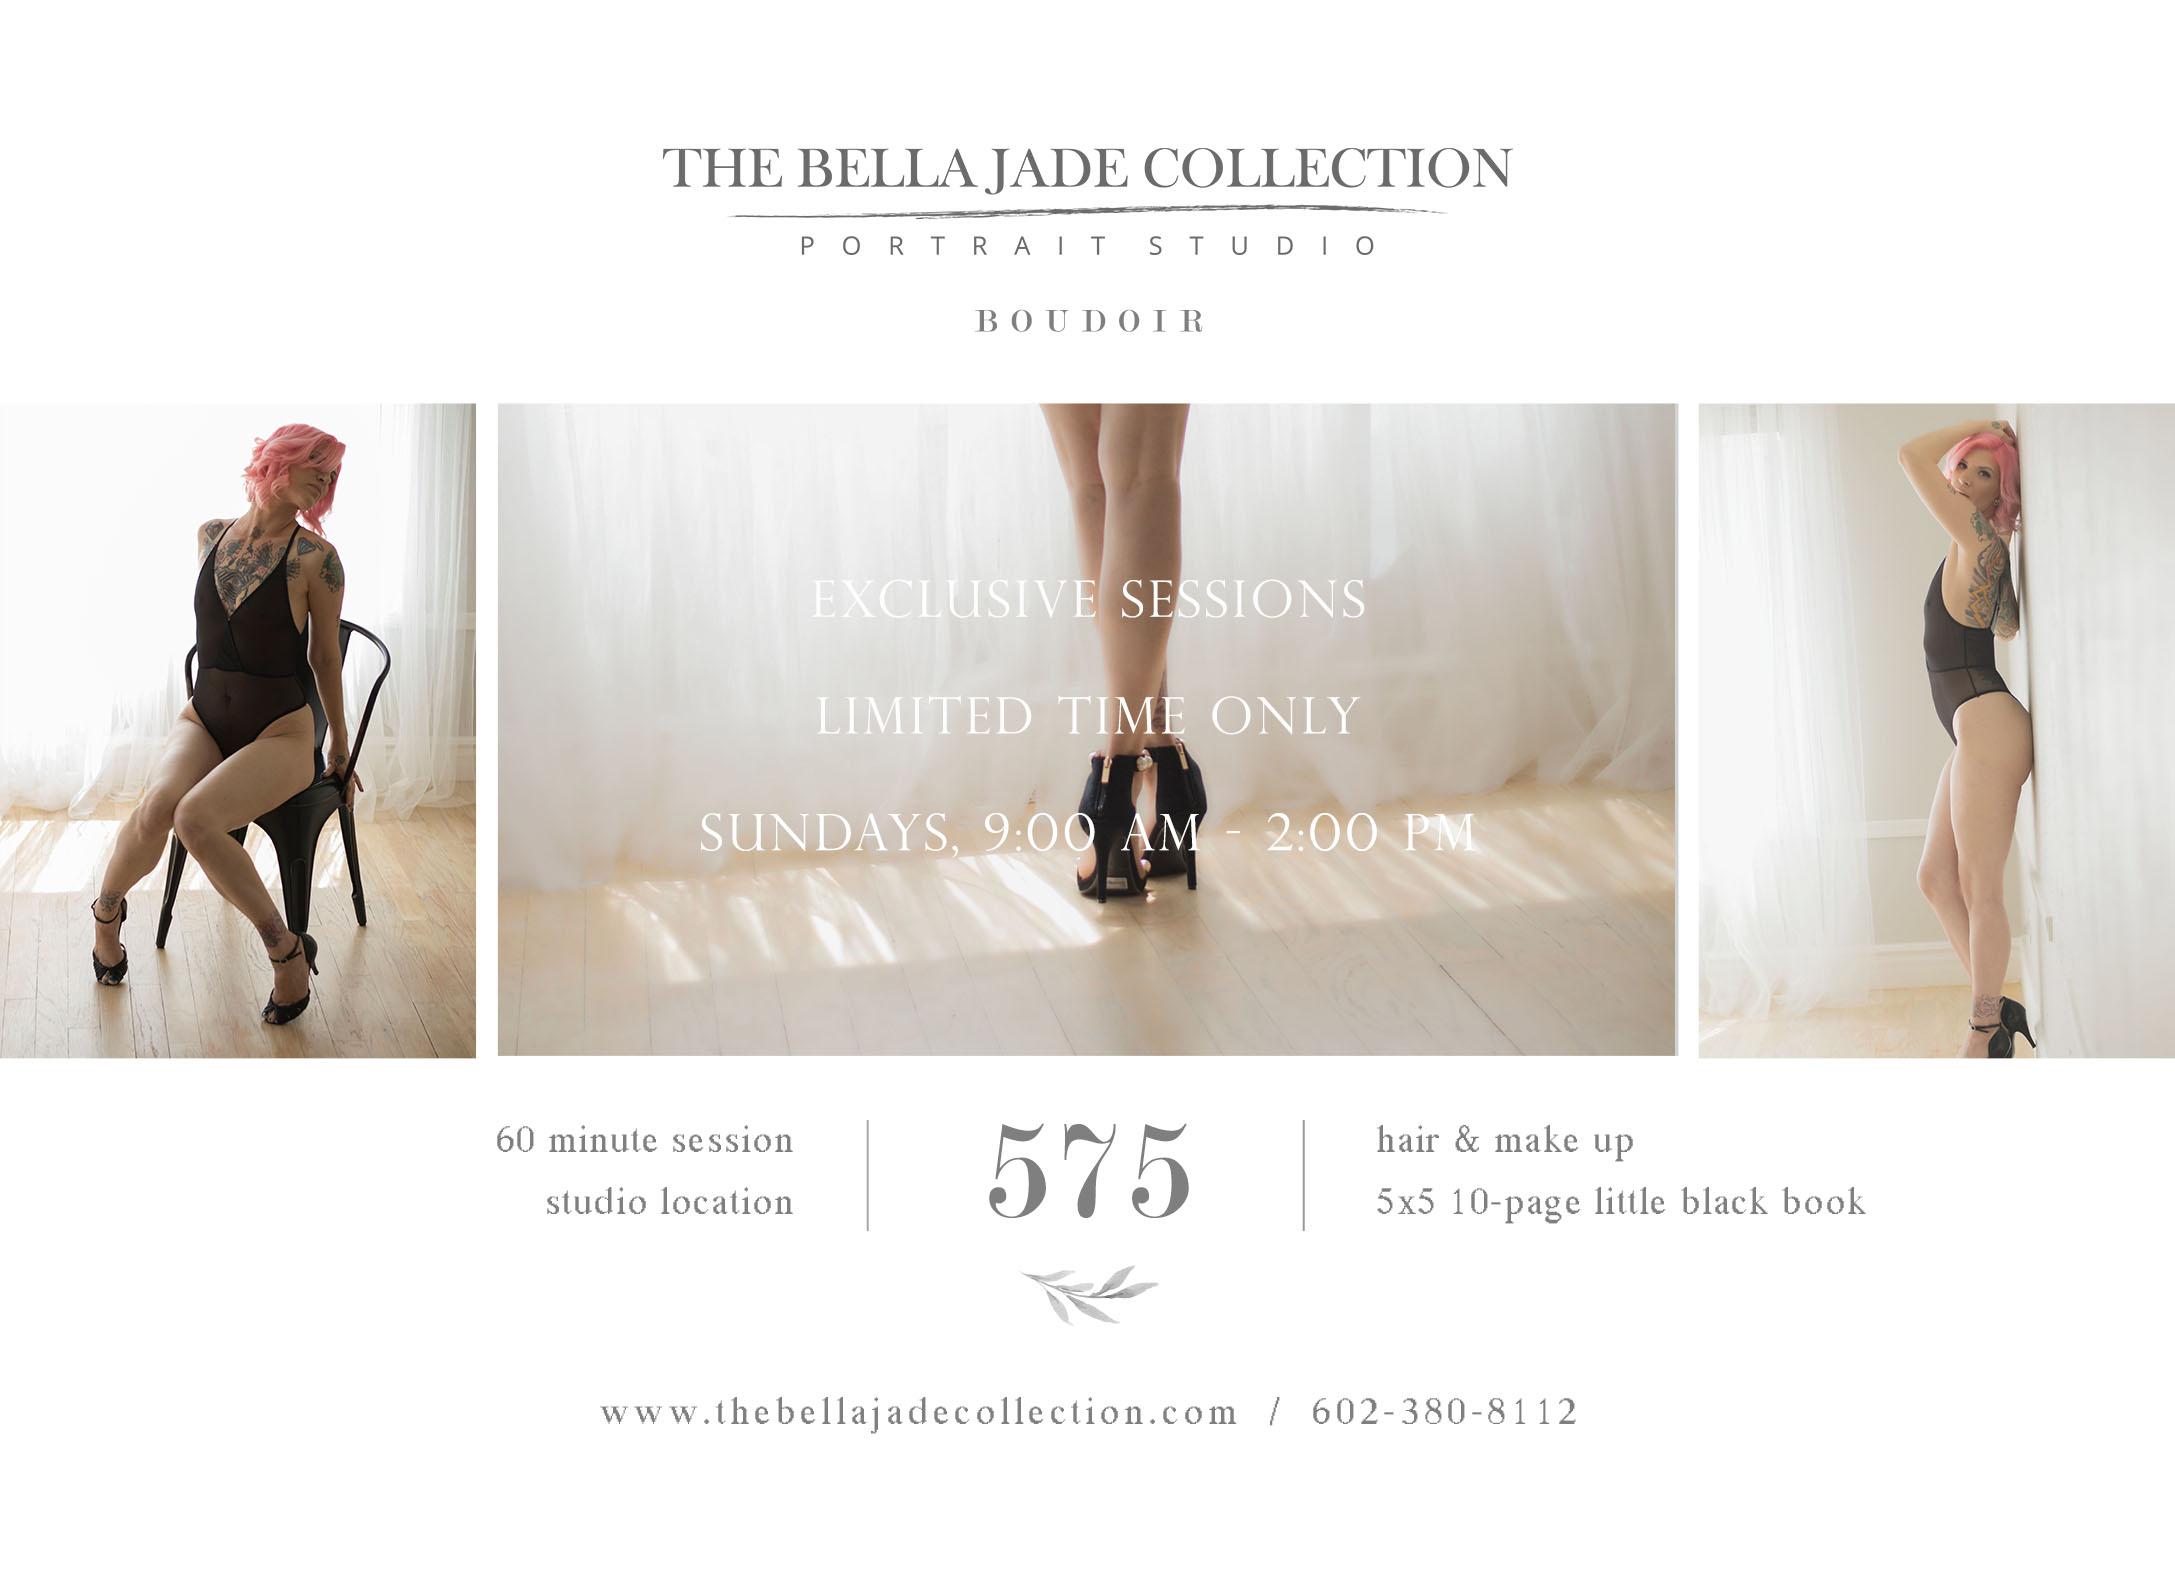 exclusive-boudoir-sessions-gilbert-mesa-az-photograhy.jpg